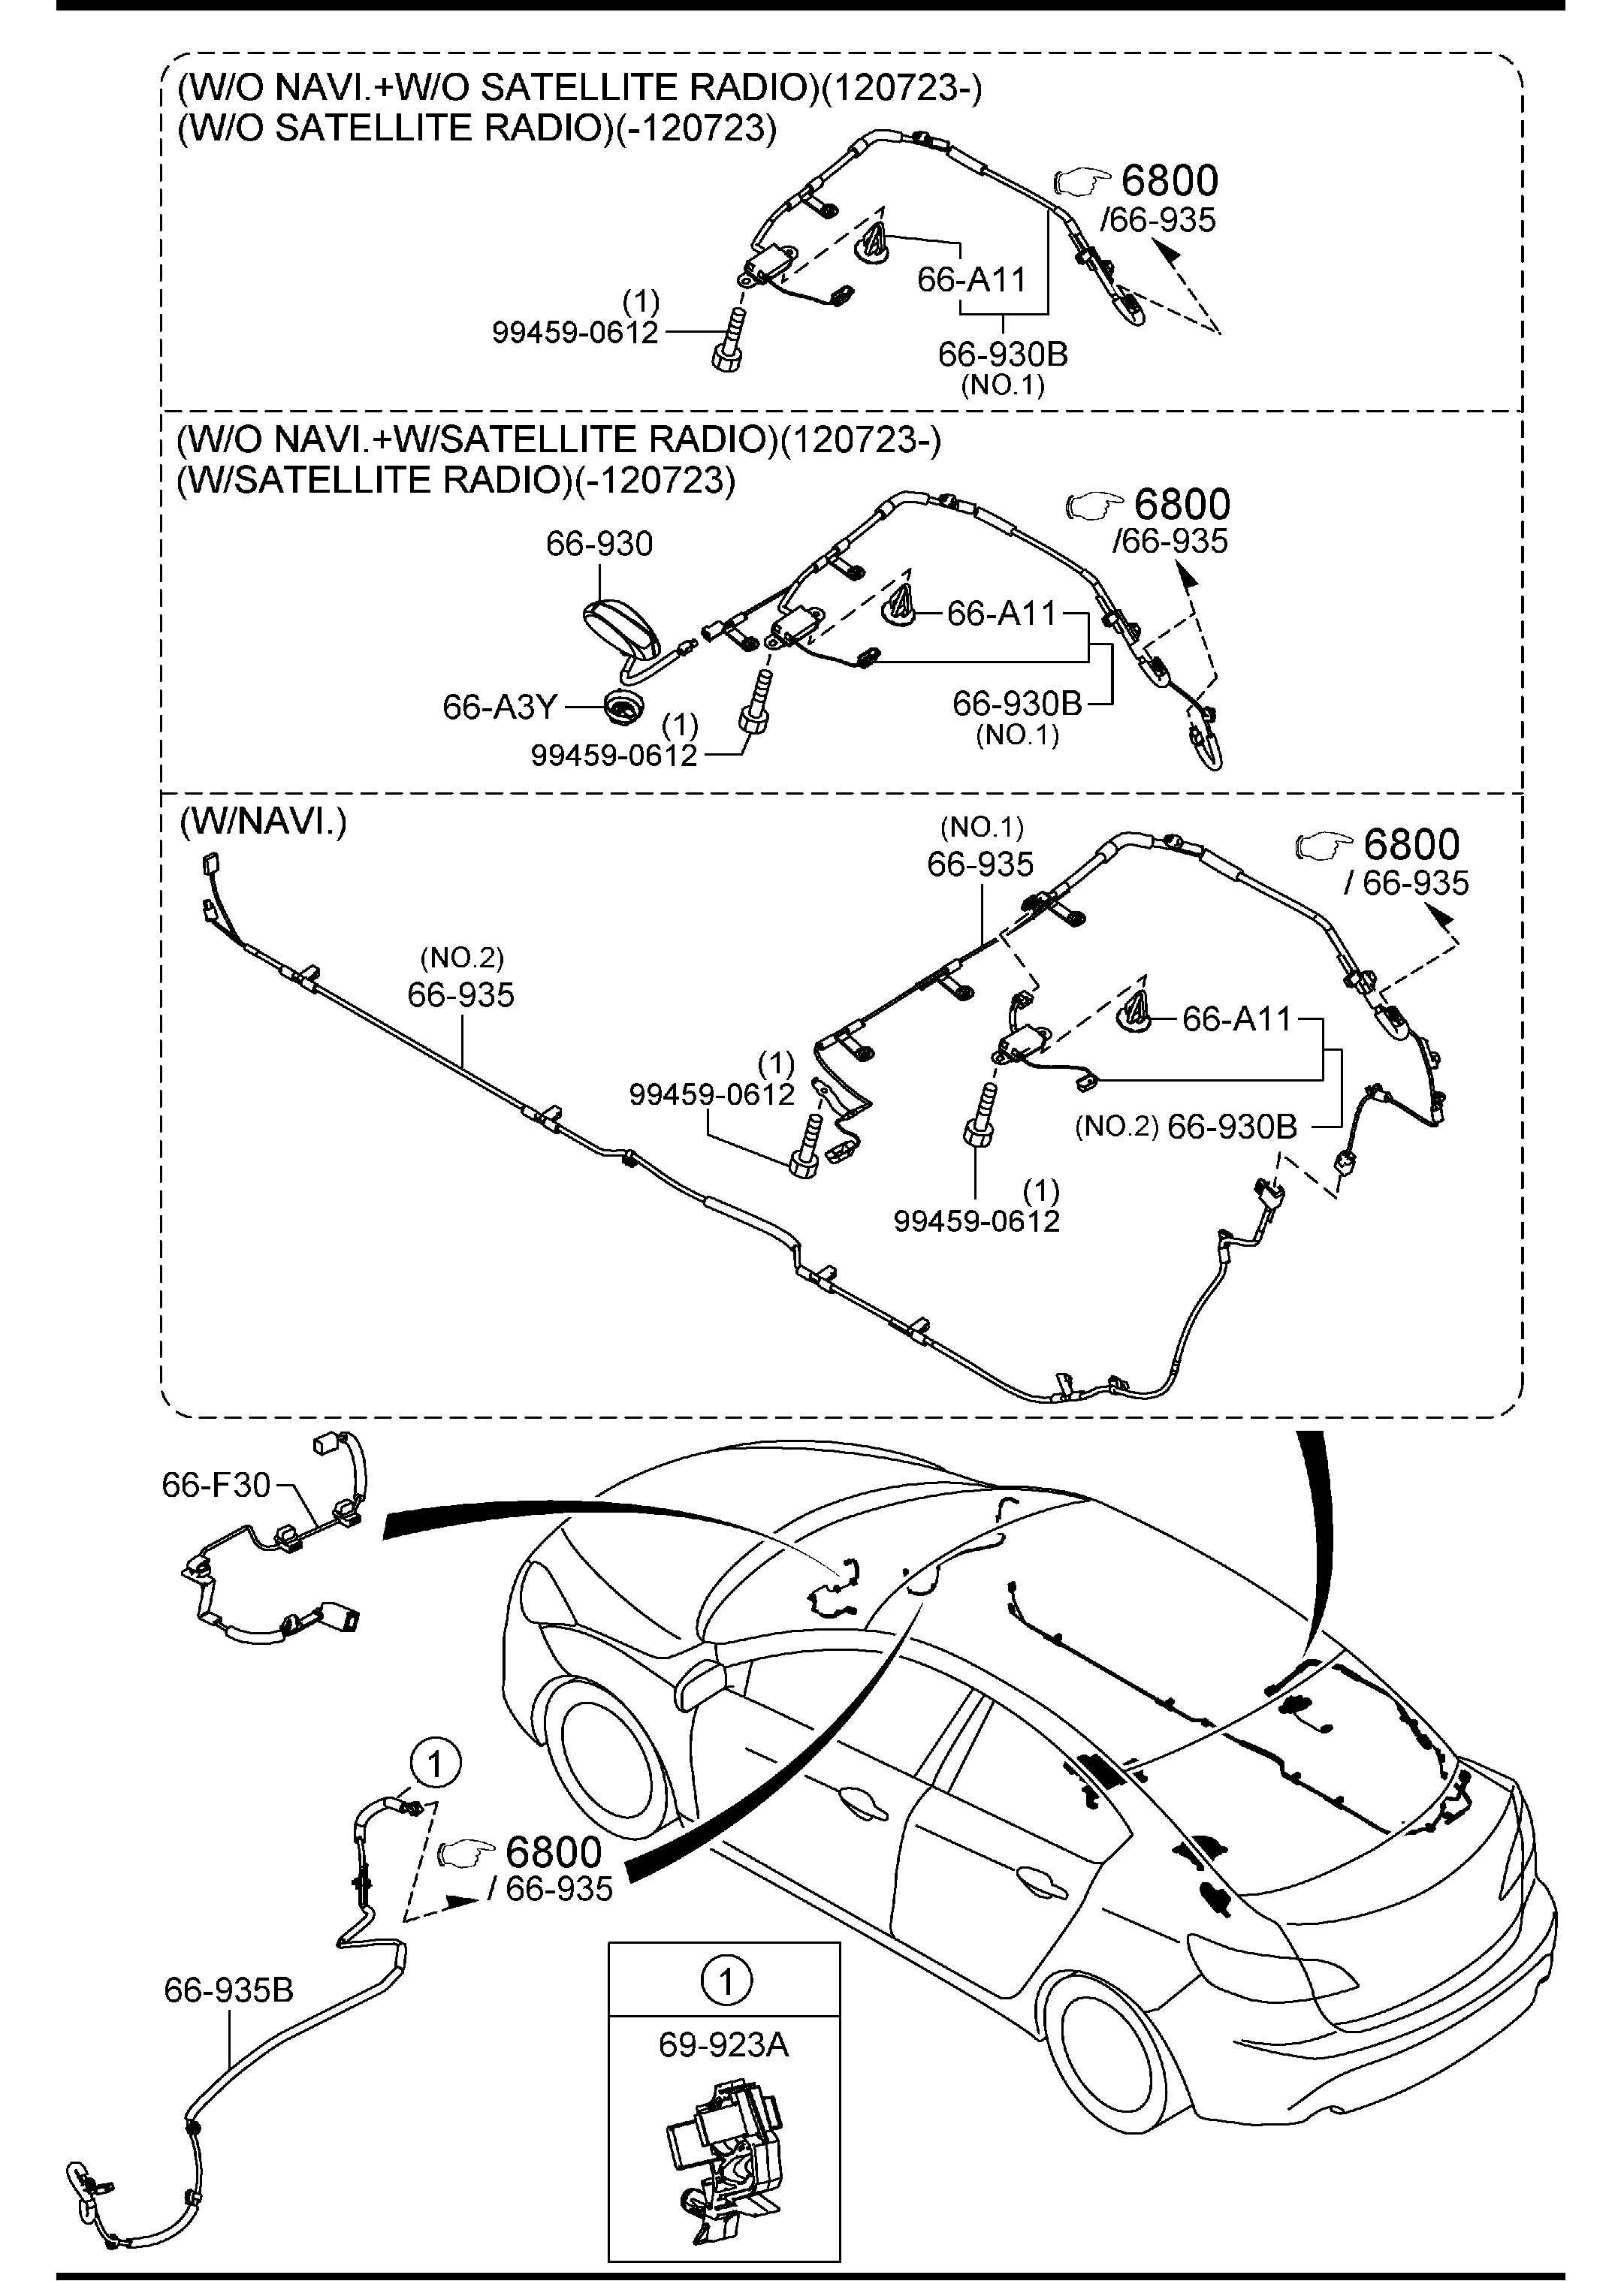 2012 Mazda Mazda 3 Radio Antenna Mast. ReplacebbrGot